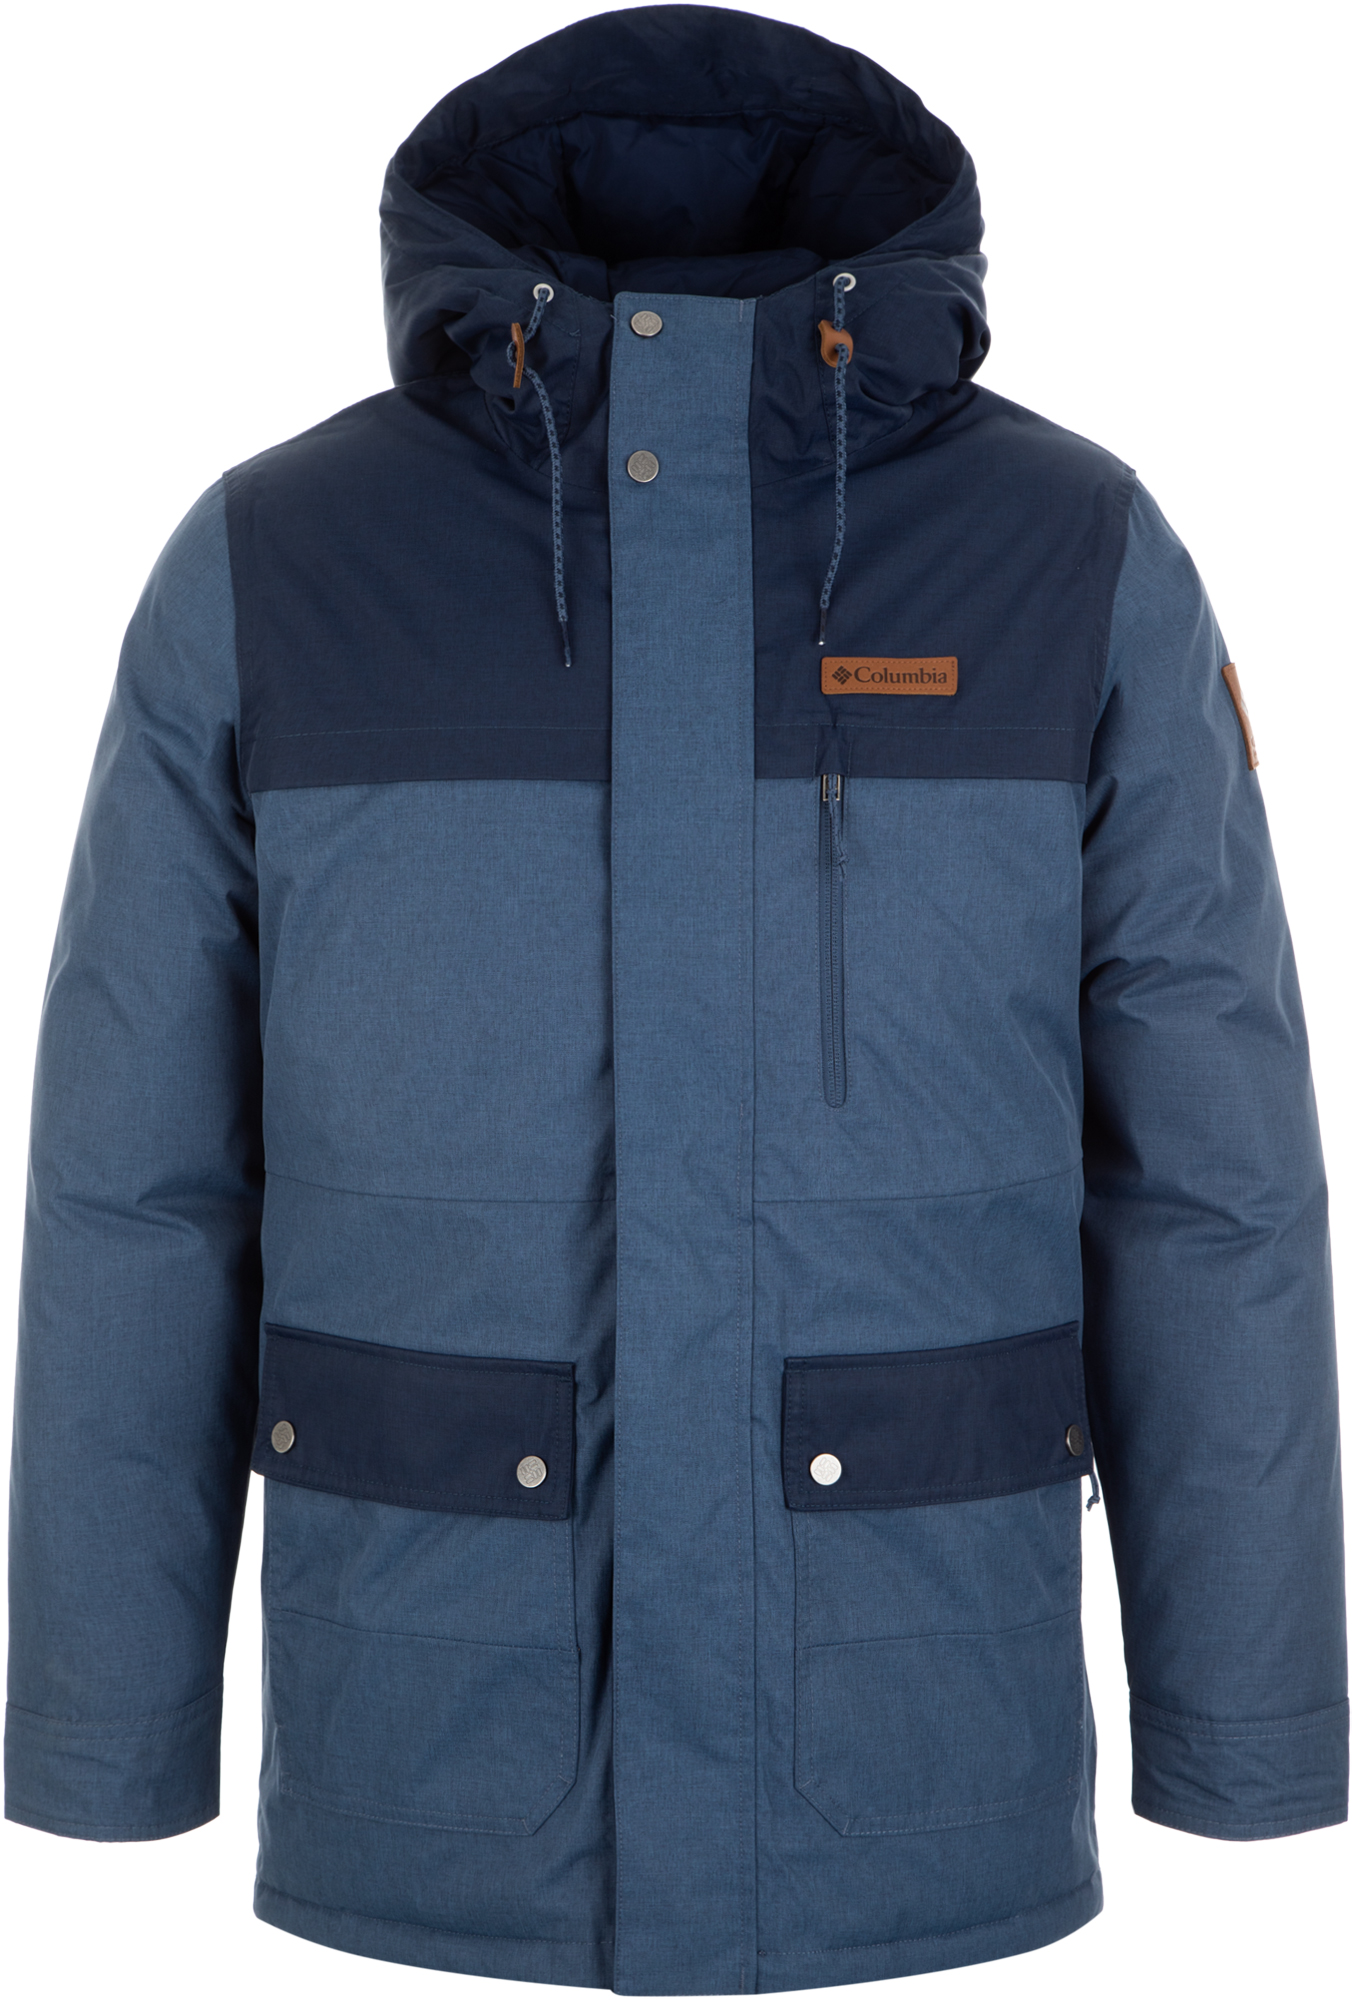 Columbia Куртка утепленная мужская Norton Bay, размер 52-54